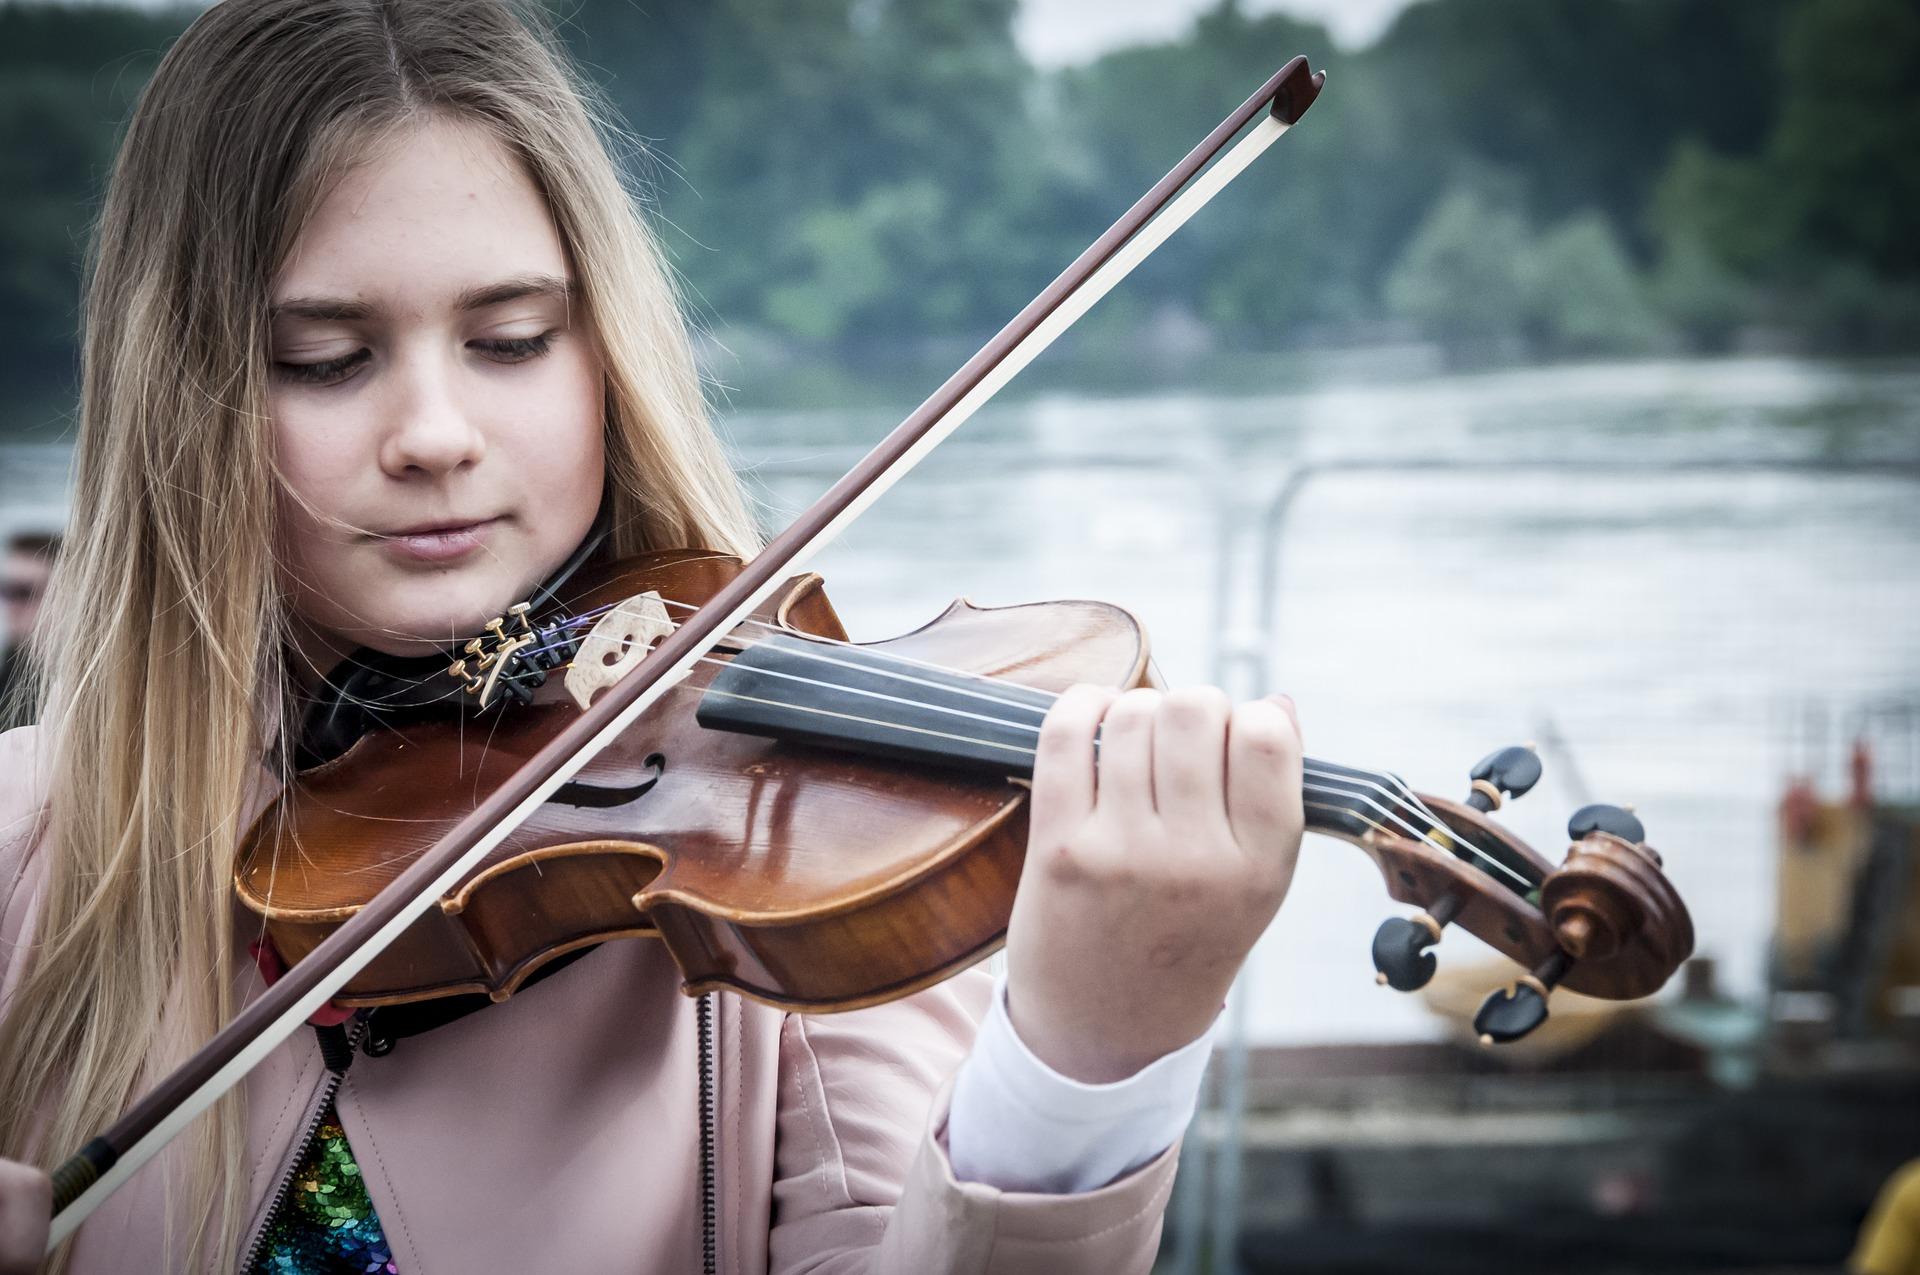 Freunde Junger Musiker e.V. Frankfurt